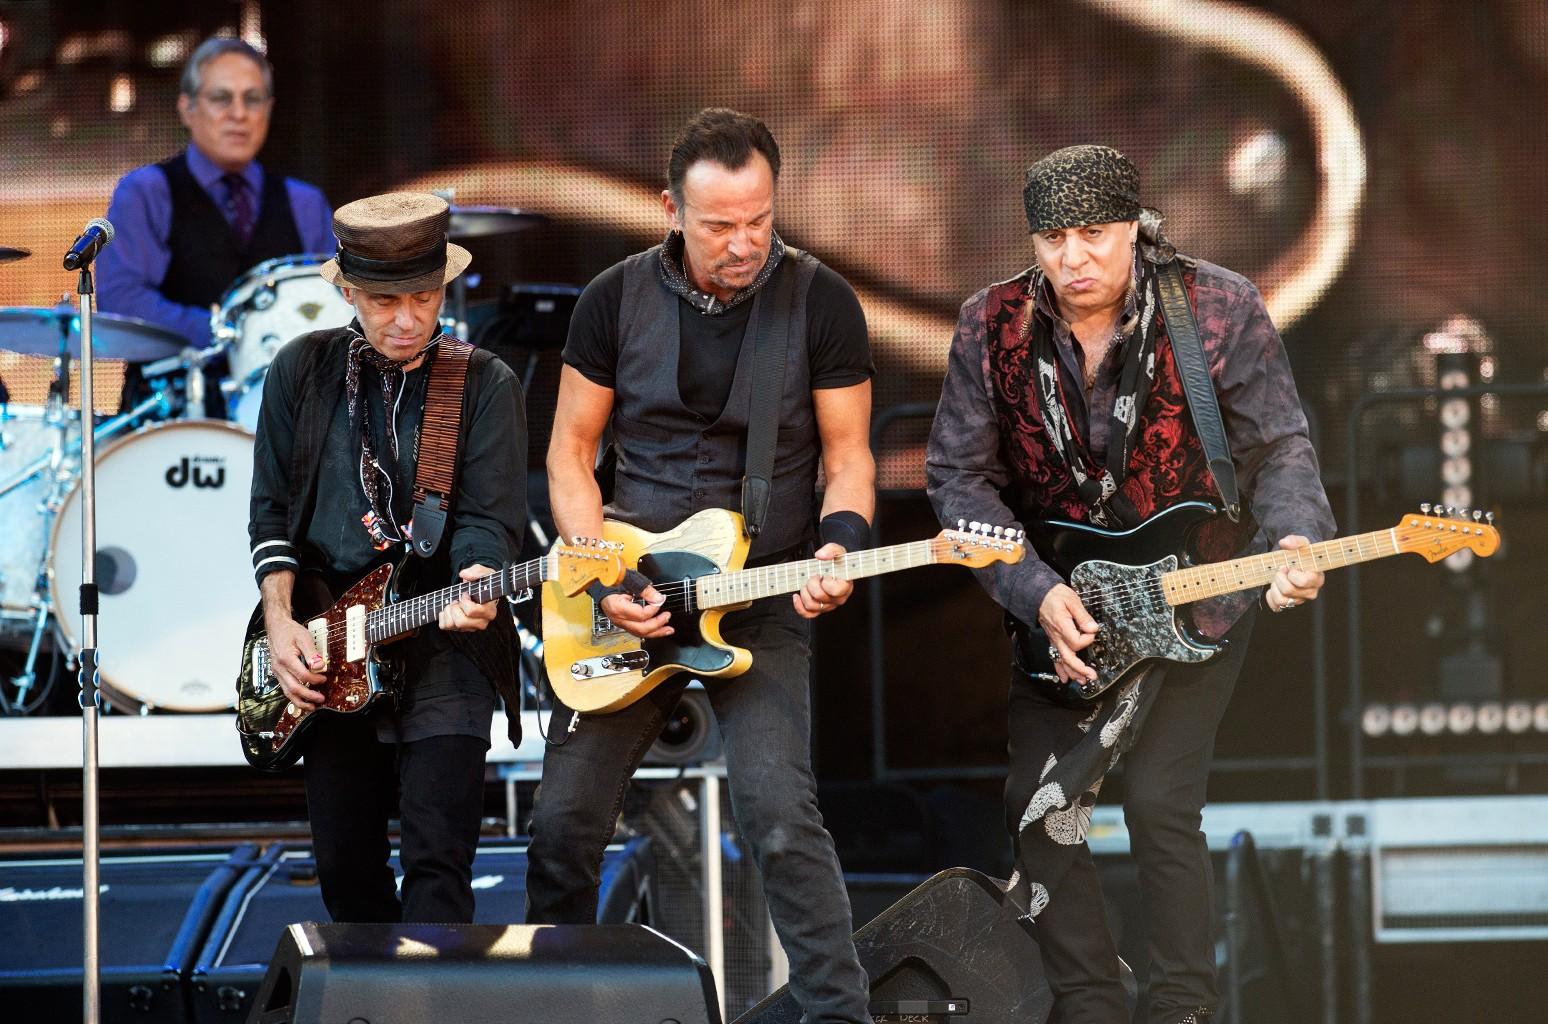 Nils Lofgren, Bruce Springsteen, Steven Van Zandt  perform with the E Street Band